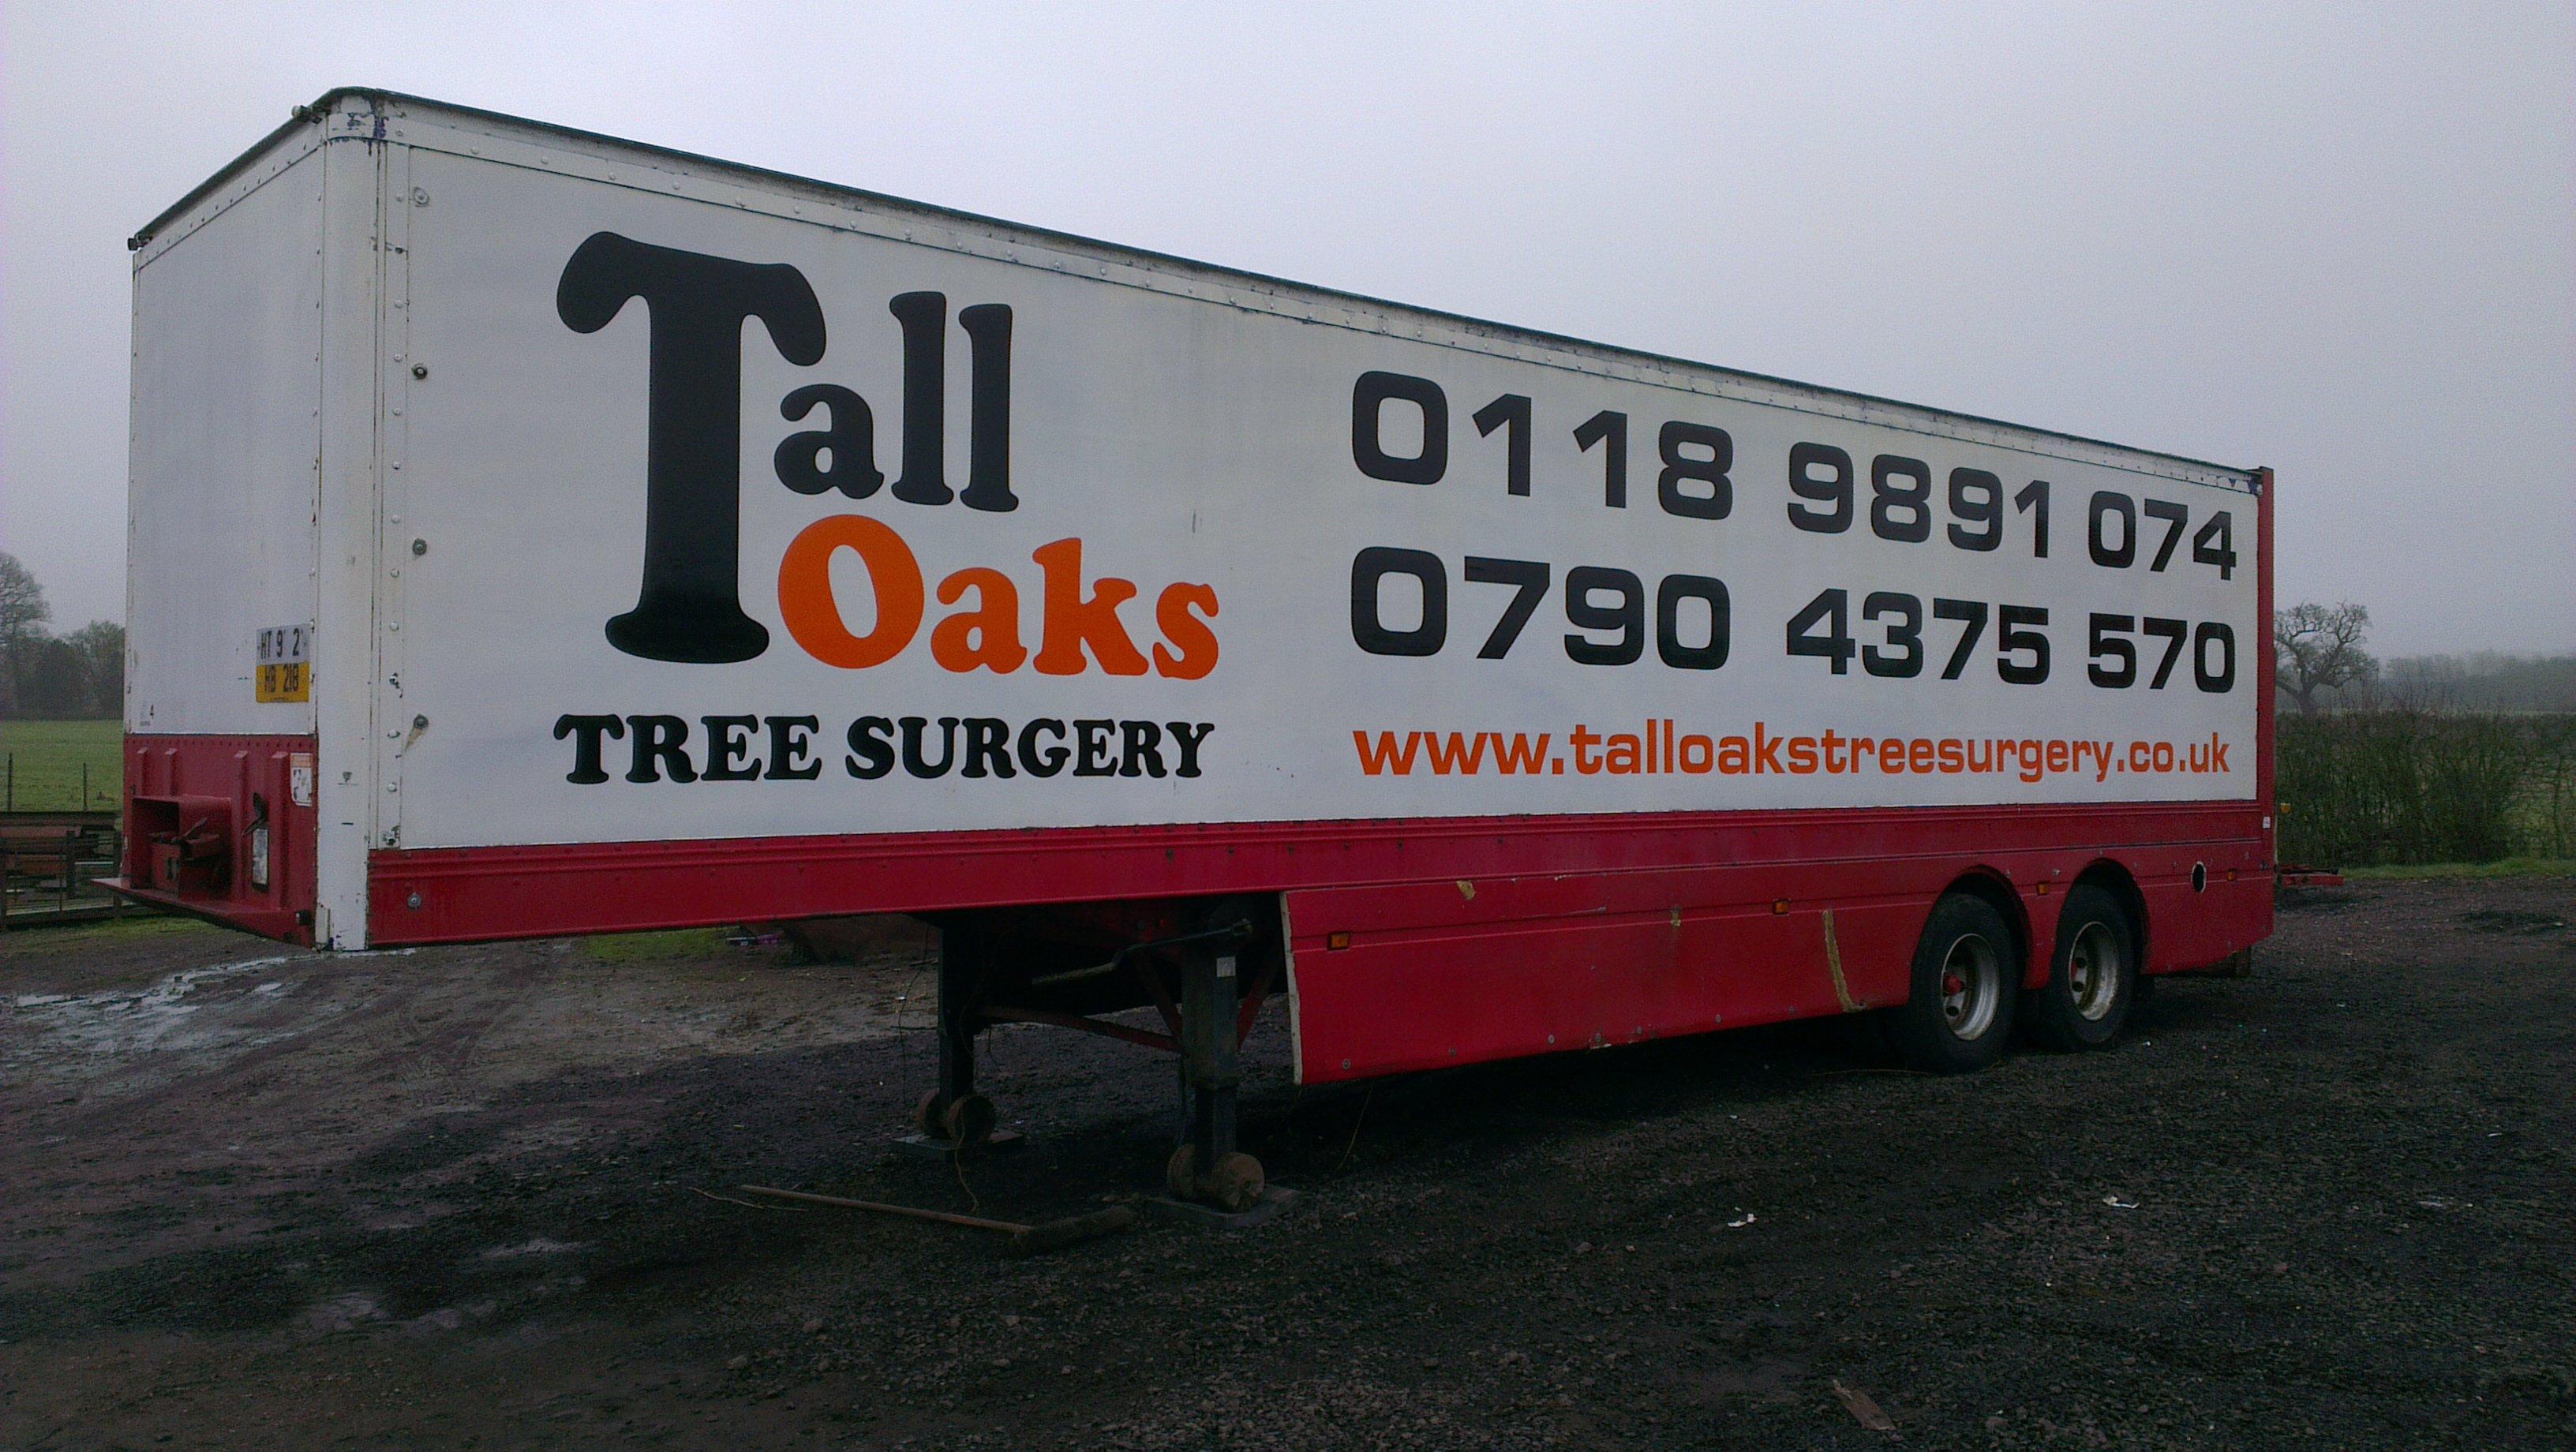 Tall Oaks tree surgery board